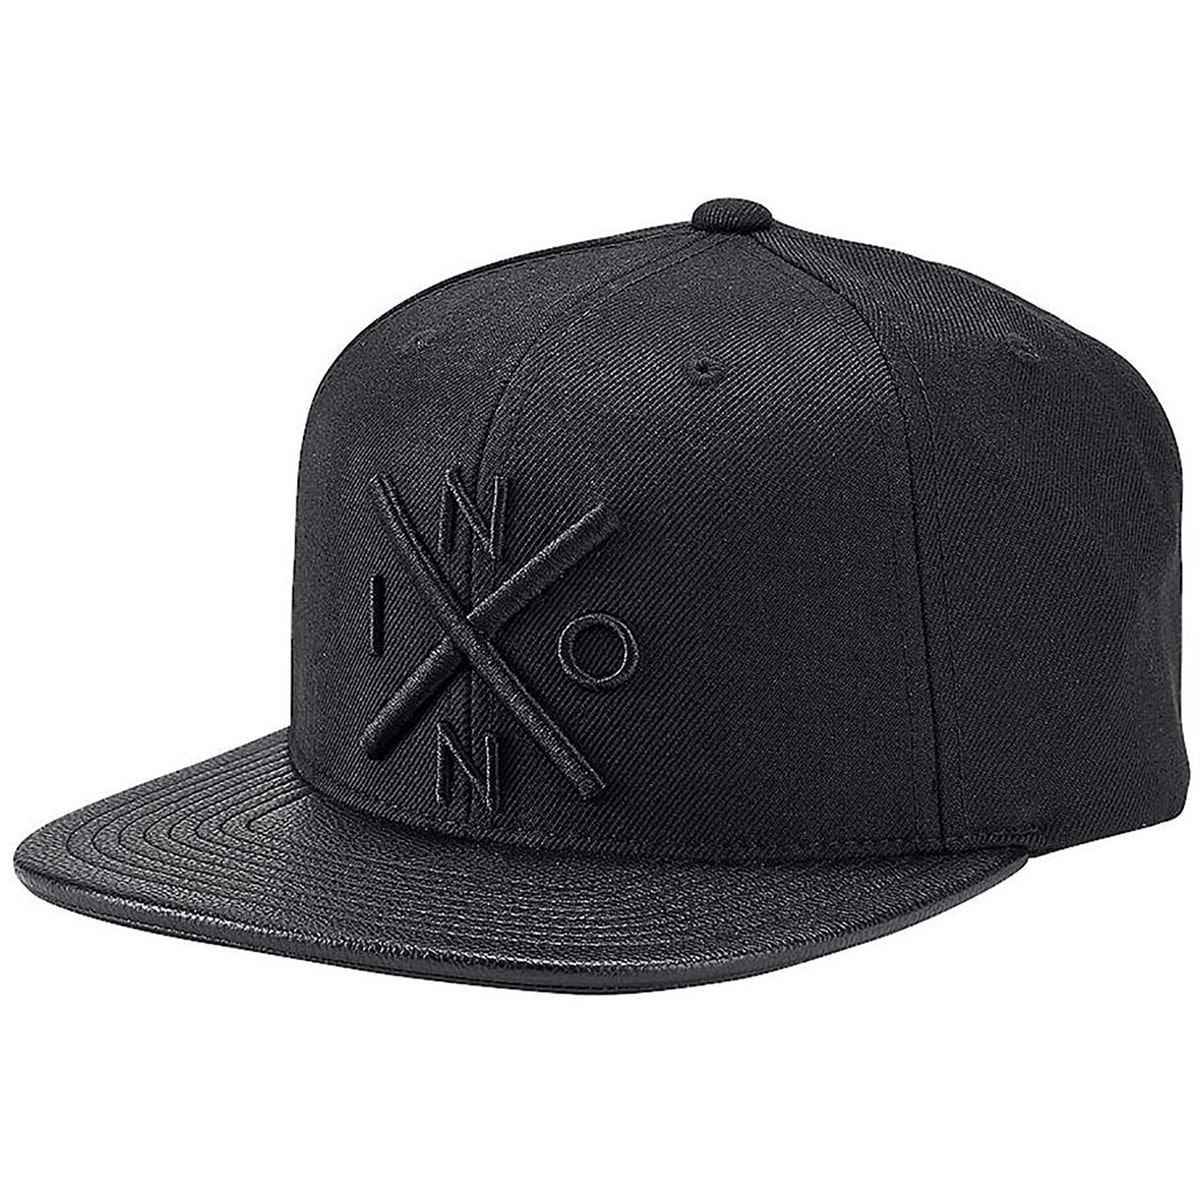 Nixon Exchange Snapback Hat All Black/Black, One Size